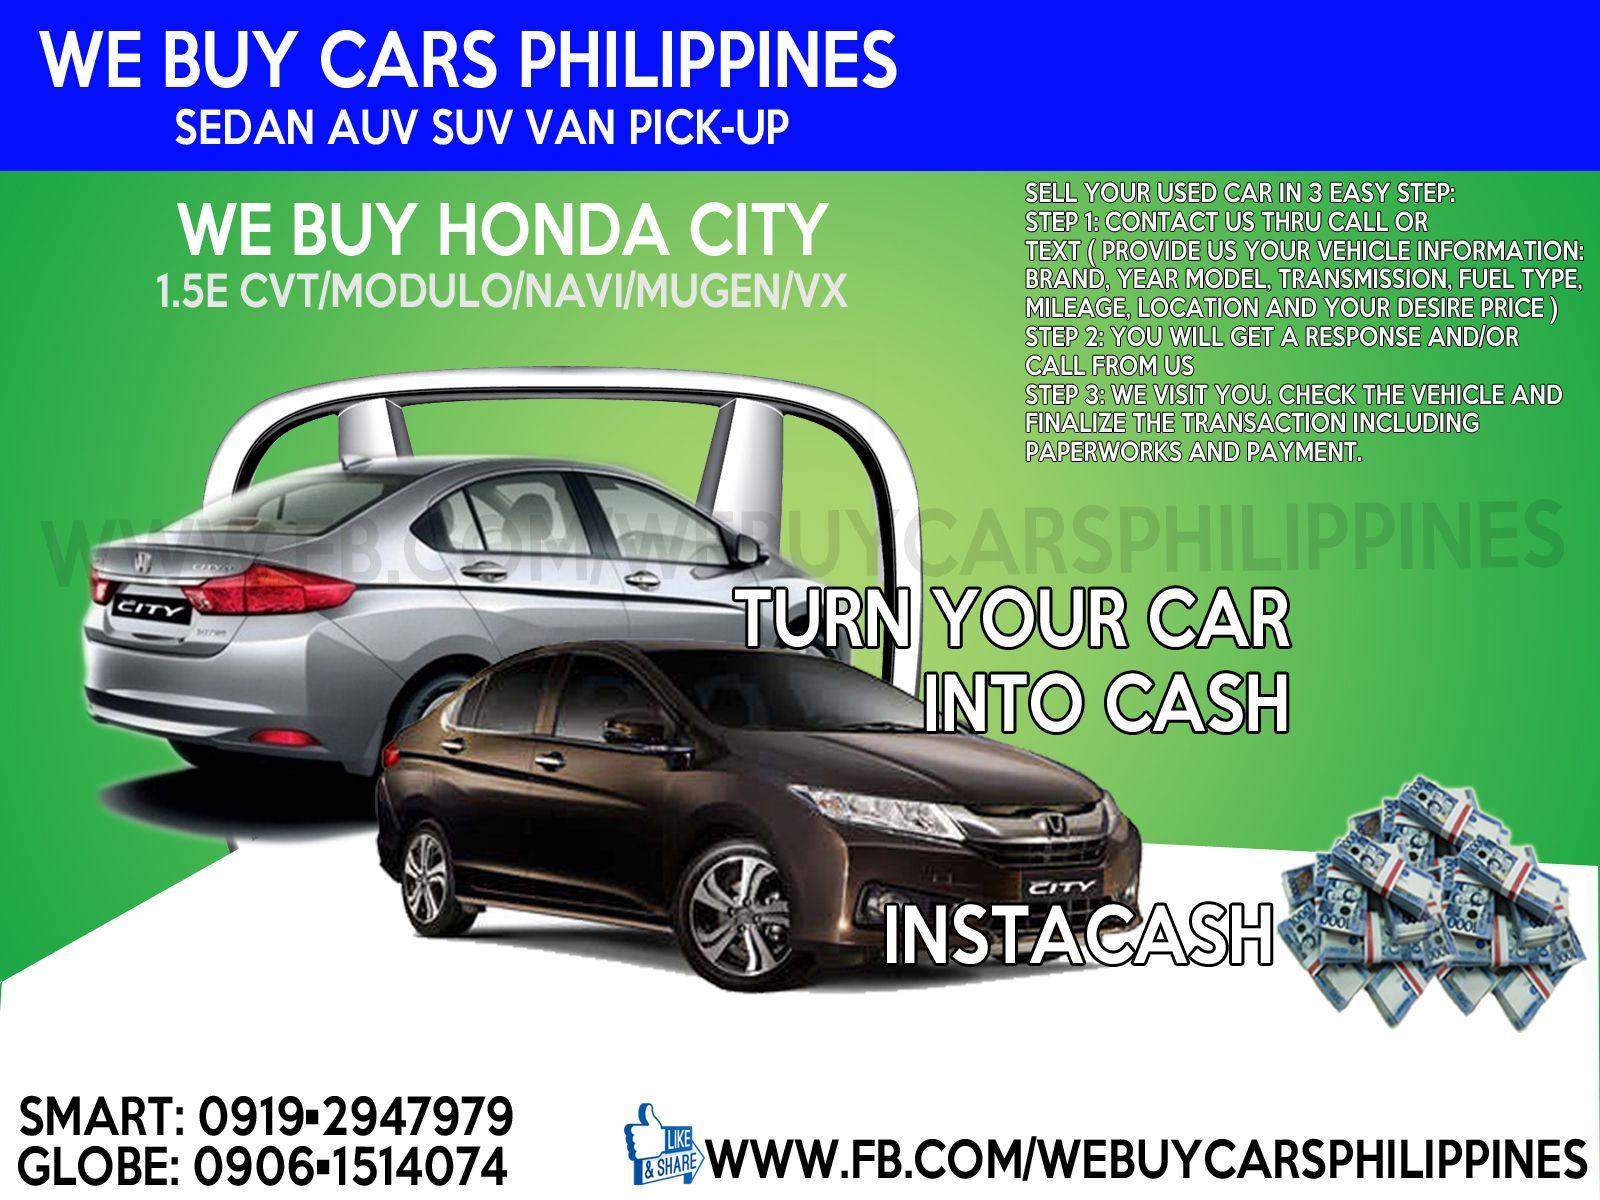 Toyota yaris 1 3 e mt 2017 philippines price amp specs autodeal - We Buy Used Honda City Philippines City 1 5 E Mtphp City 1 5 E Cvtphp City 1 5